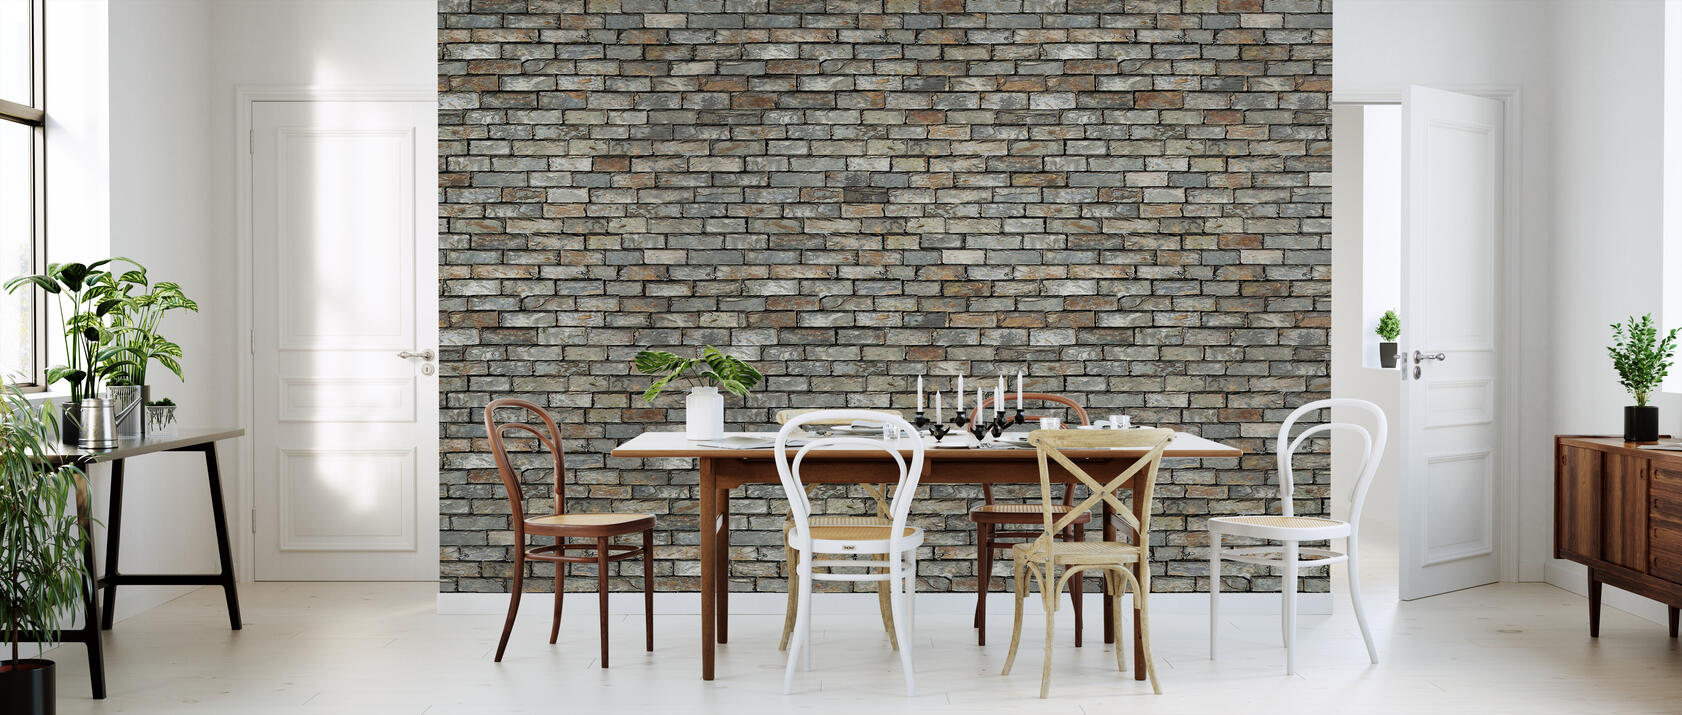 stone wall fototapete nach ma photowall. Black Bedroom Furniture Sets. Home Design Ideas